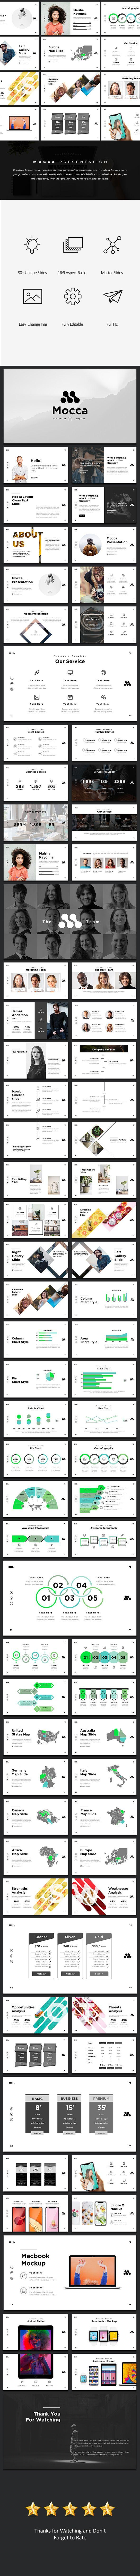 Mocca Stylish Google Slides | Presentation templates, Template and ...